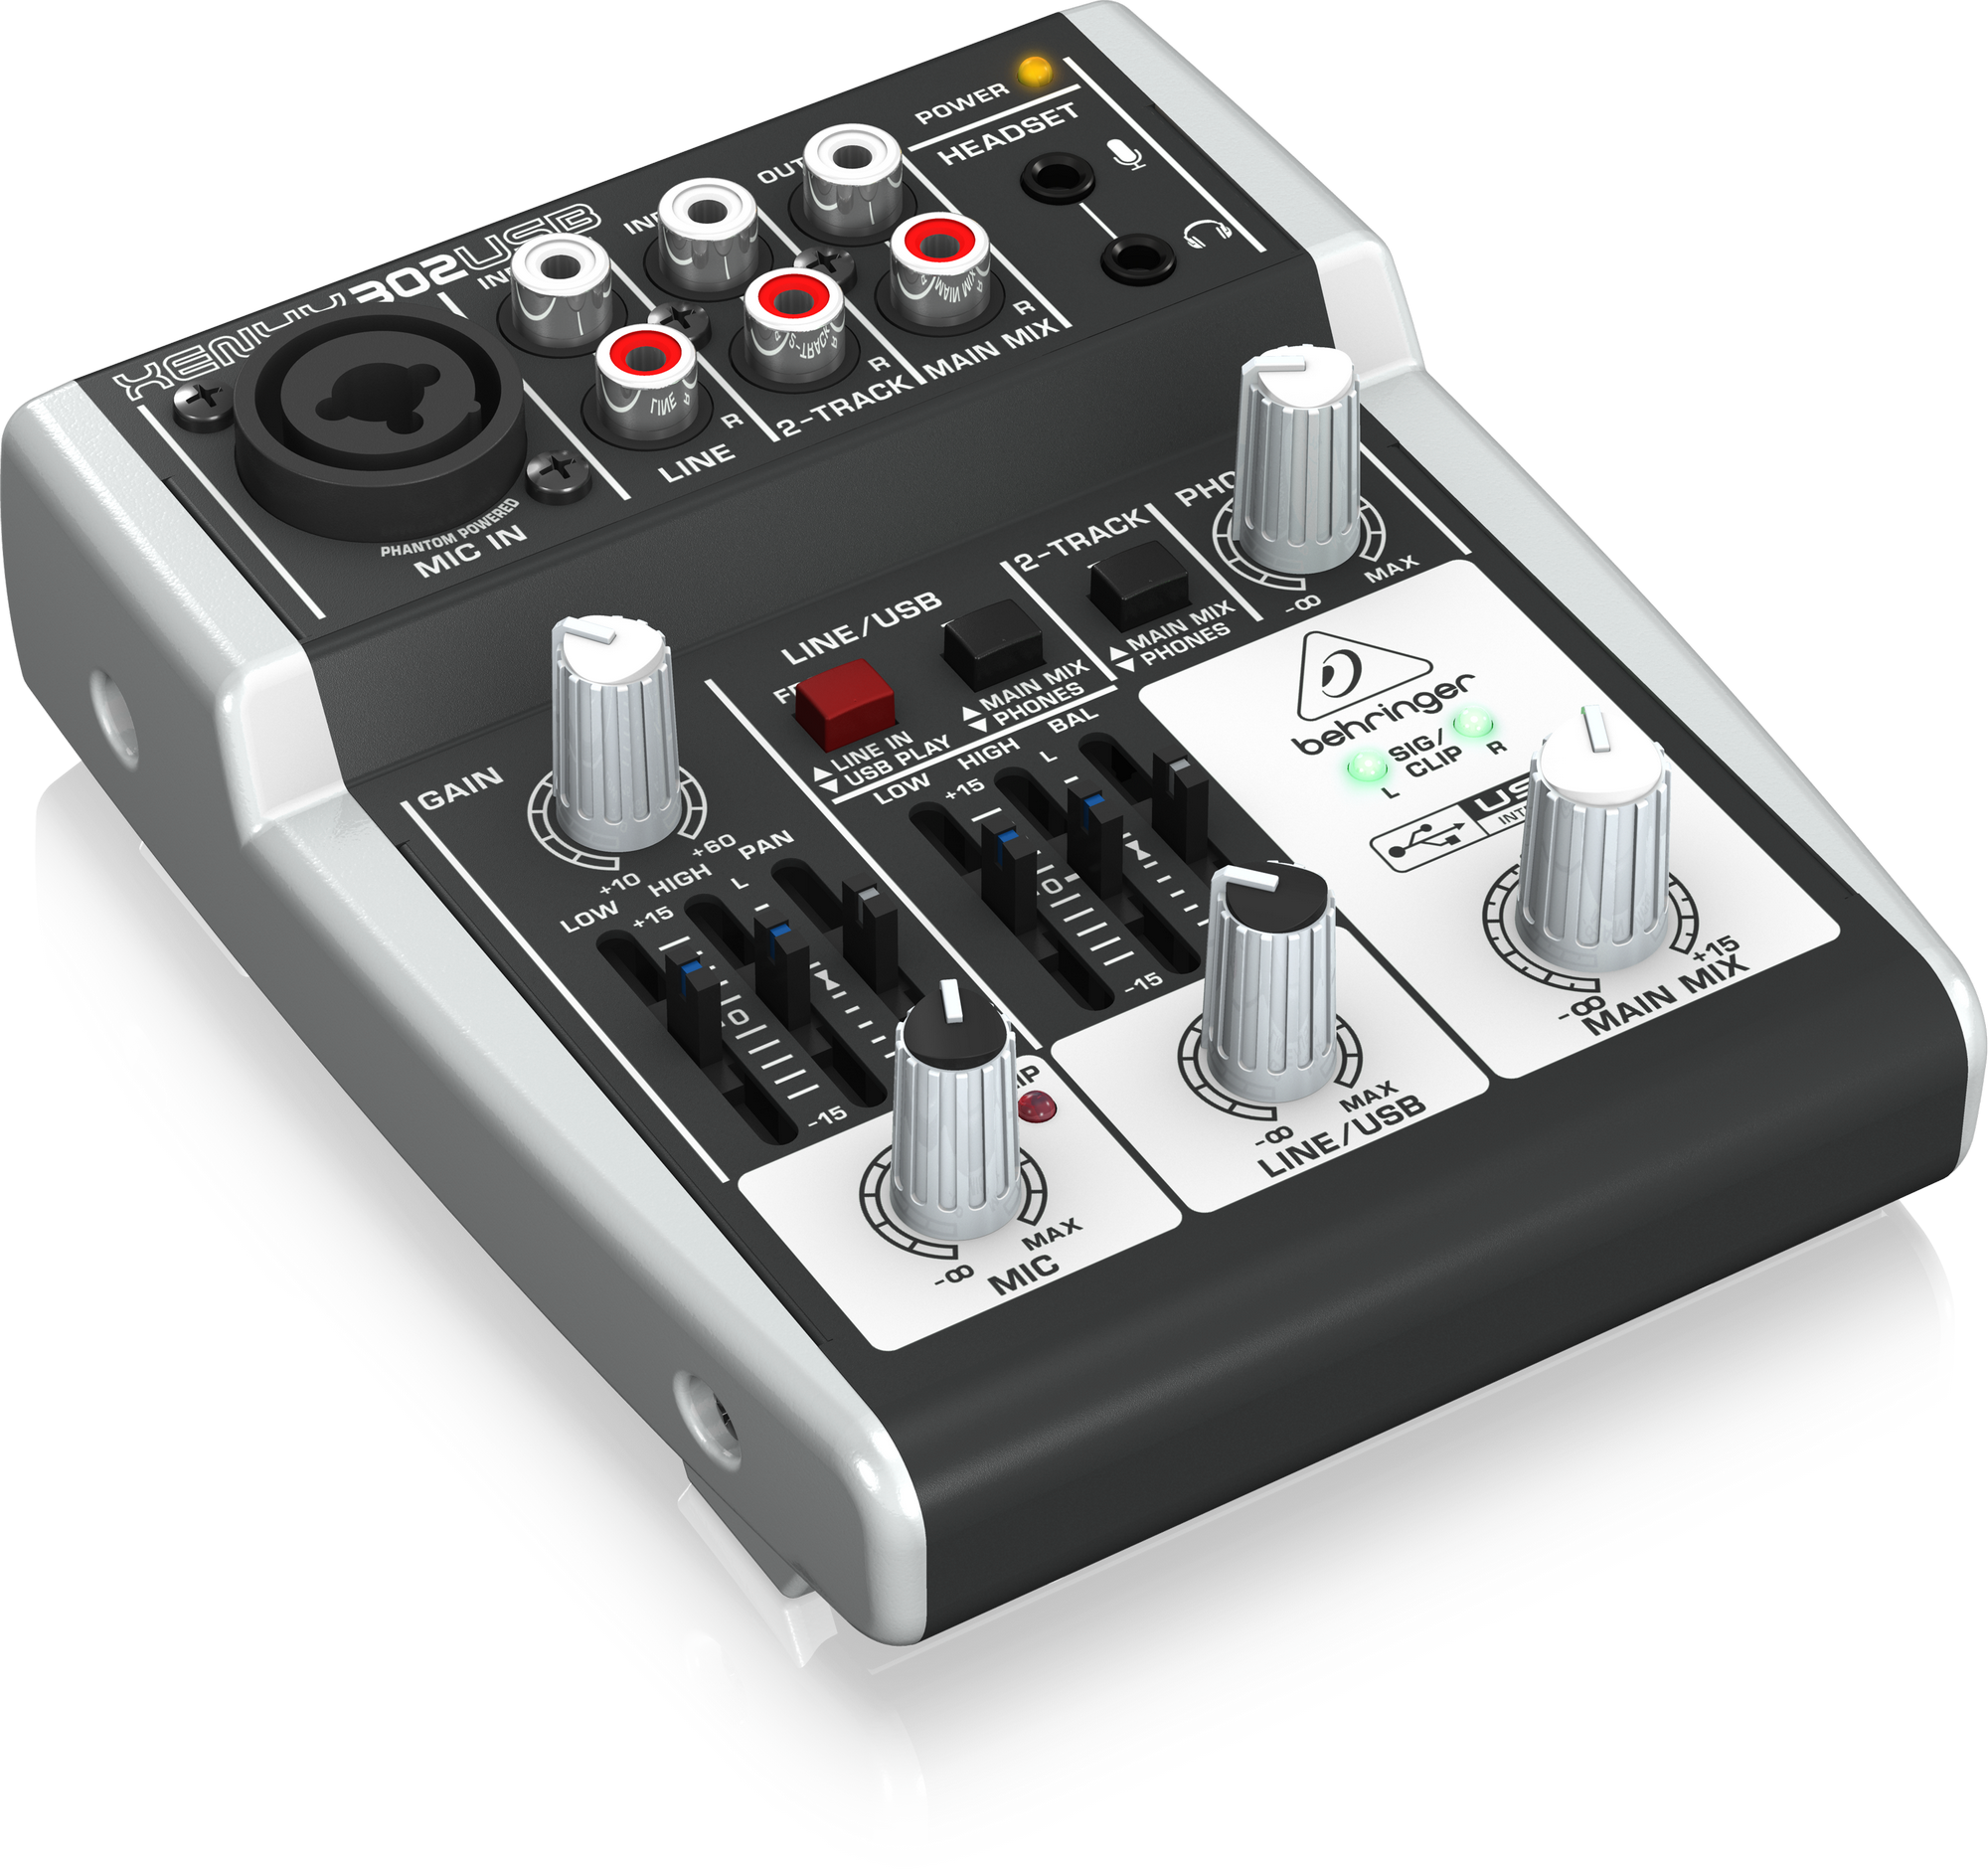 Behringer Xenyx 302USB - Table mixage analogique